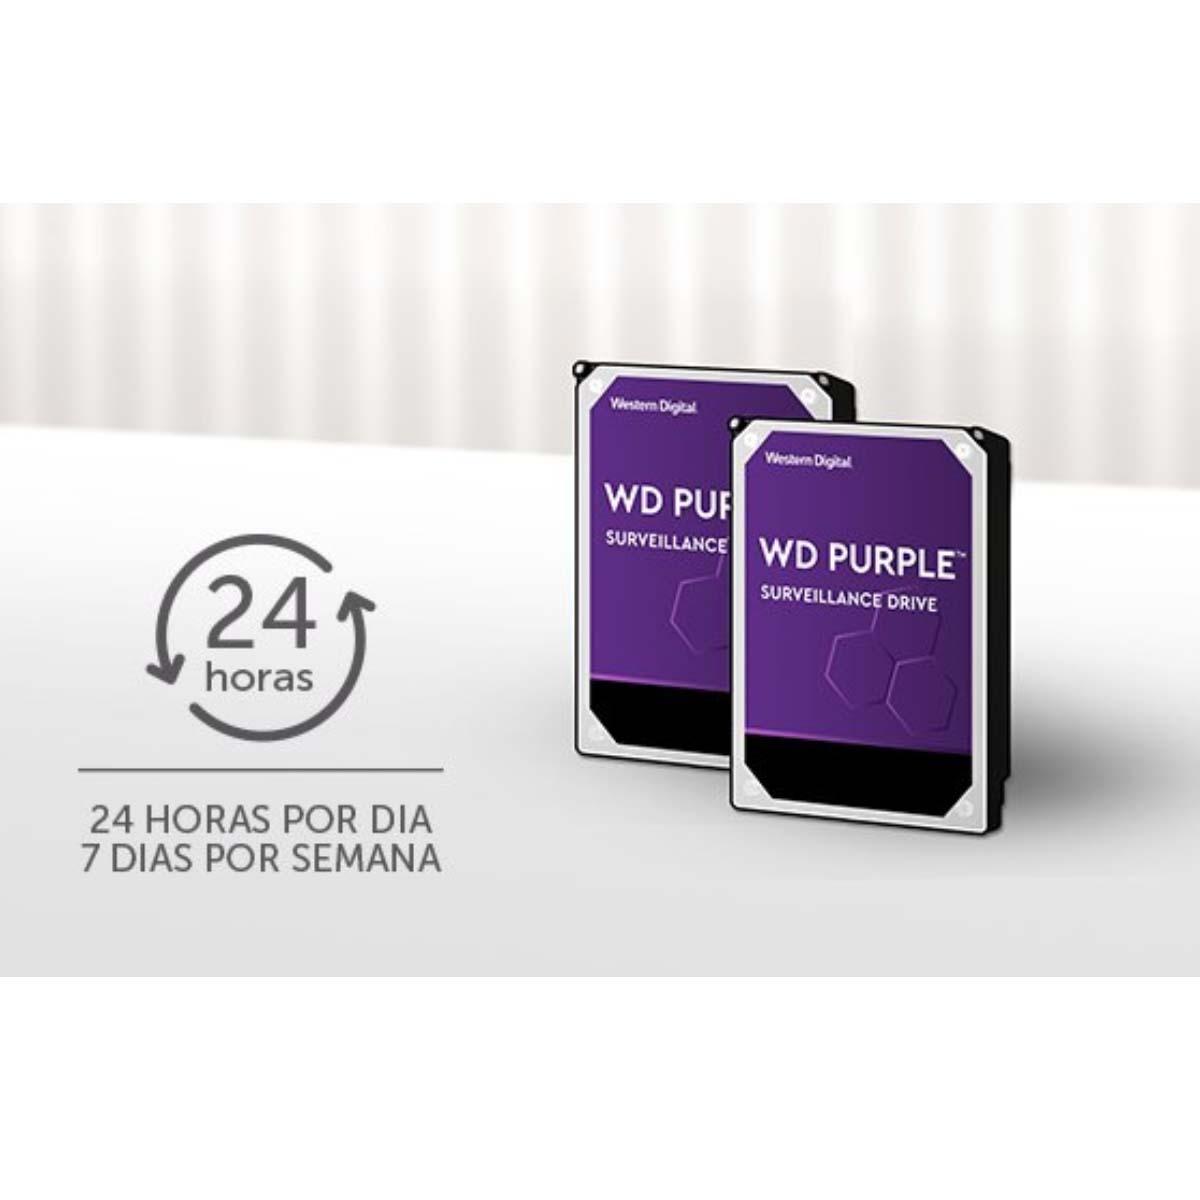 HD INTELBRAS DISCO RÍGIDO WD PURPLE 4 TERA PARA CFTV